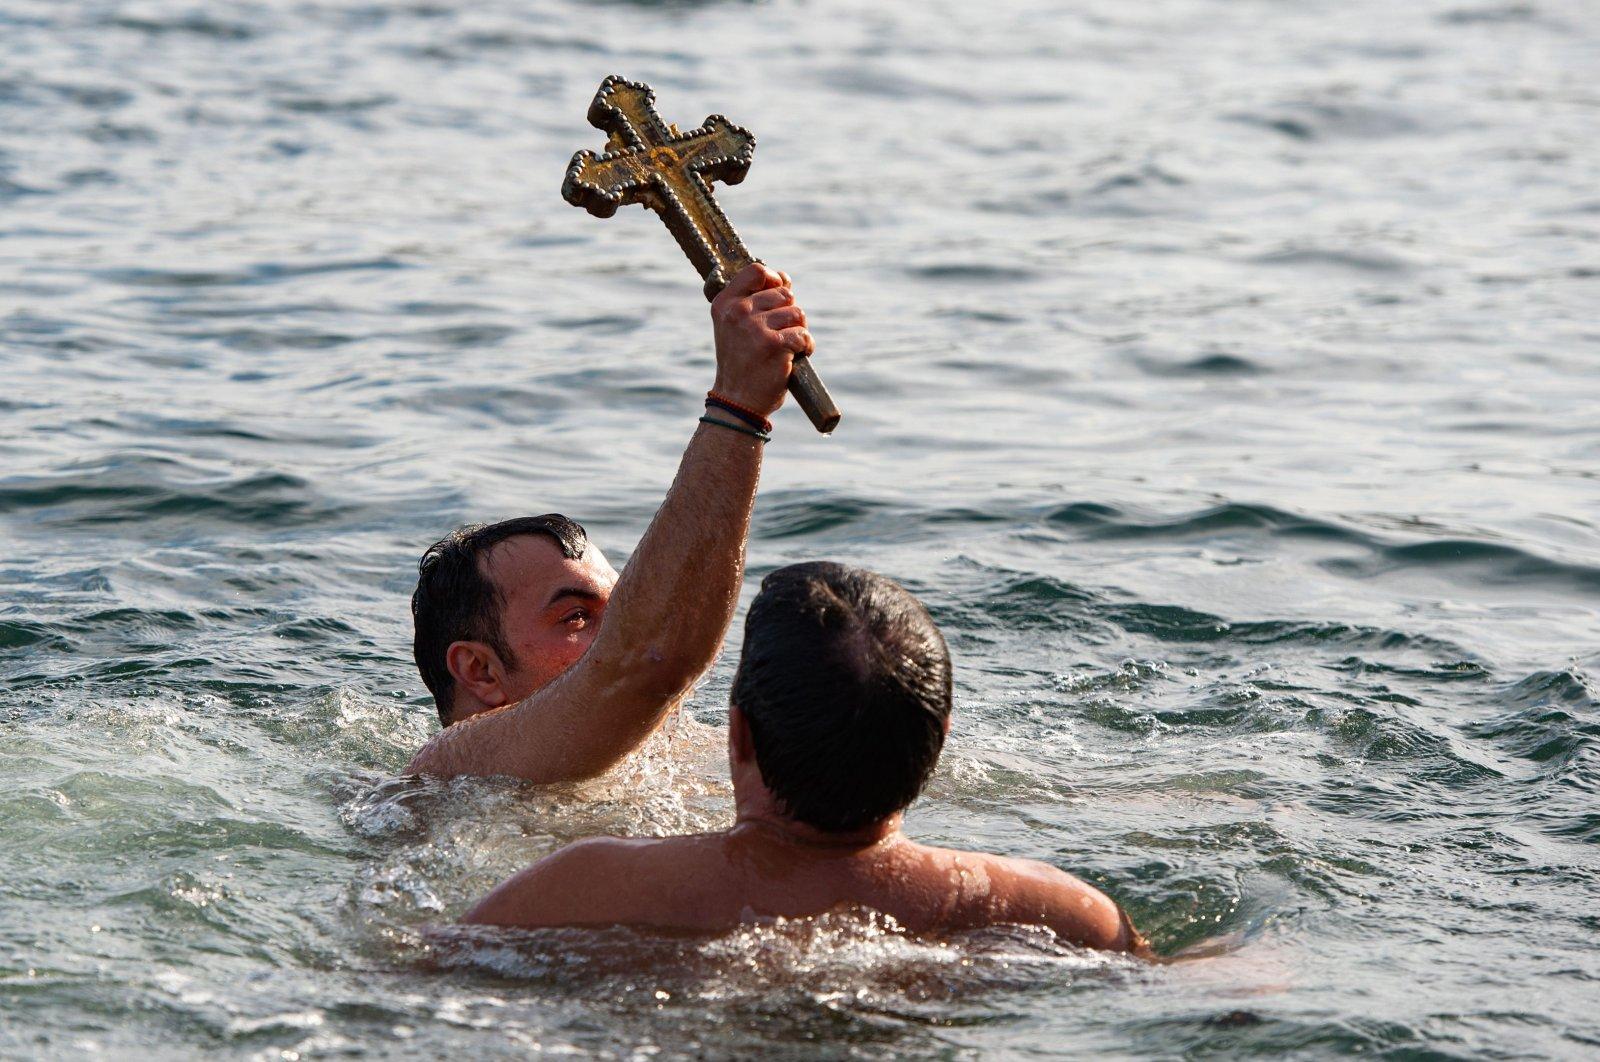 Orthodox faithful Vasili Kürkçü celebrates as he retrieves the wooden cross, in Istanbul, Turkey, Jan. 6, 2021. (AFP Photo)